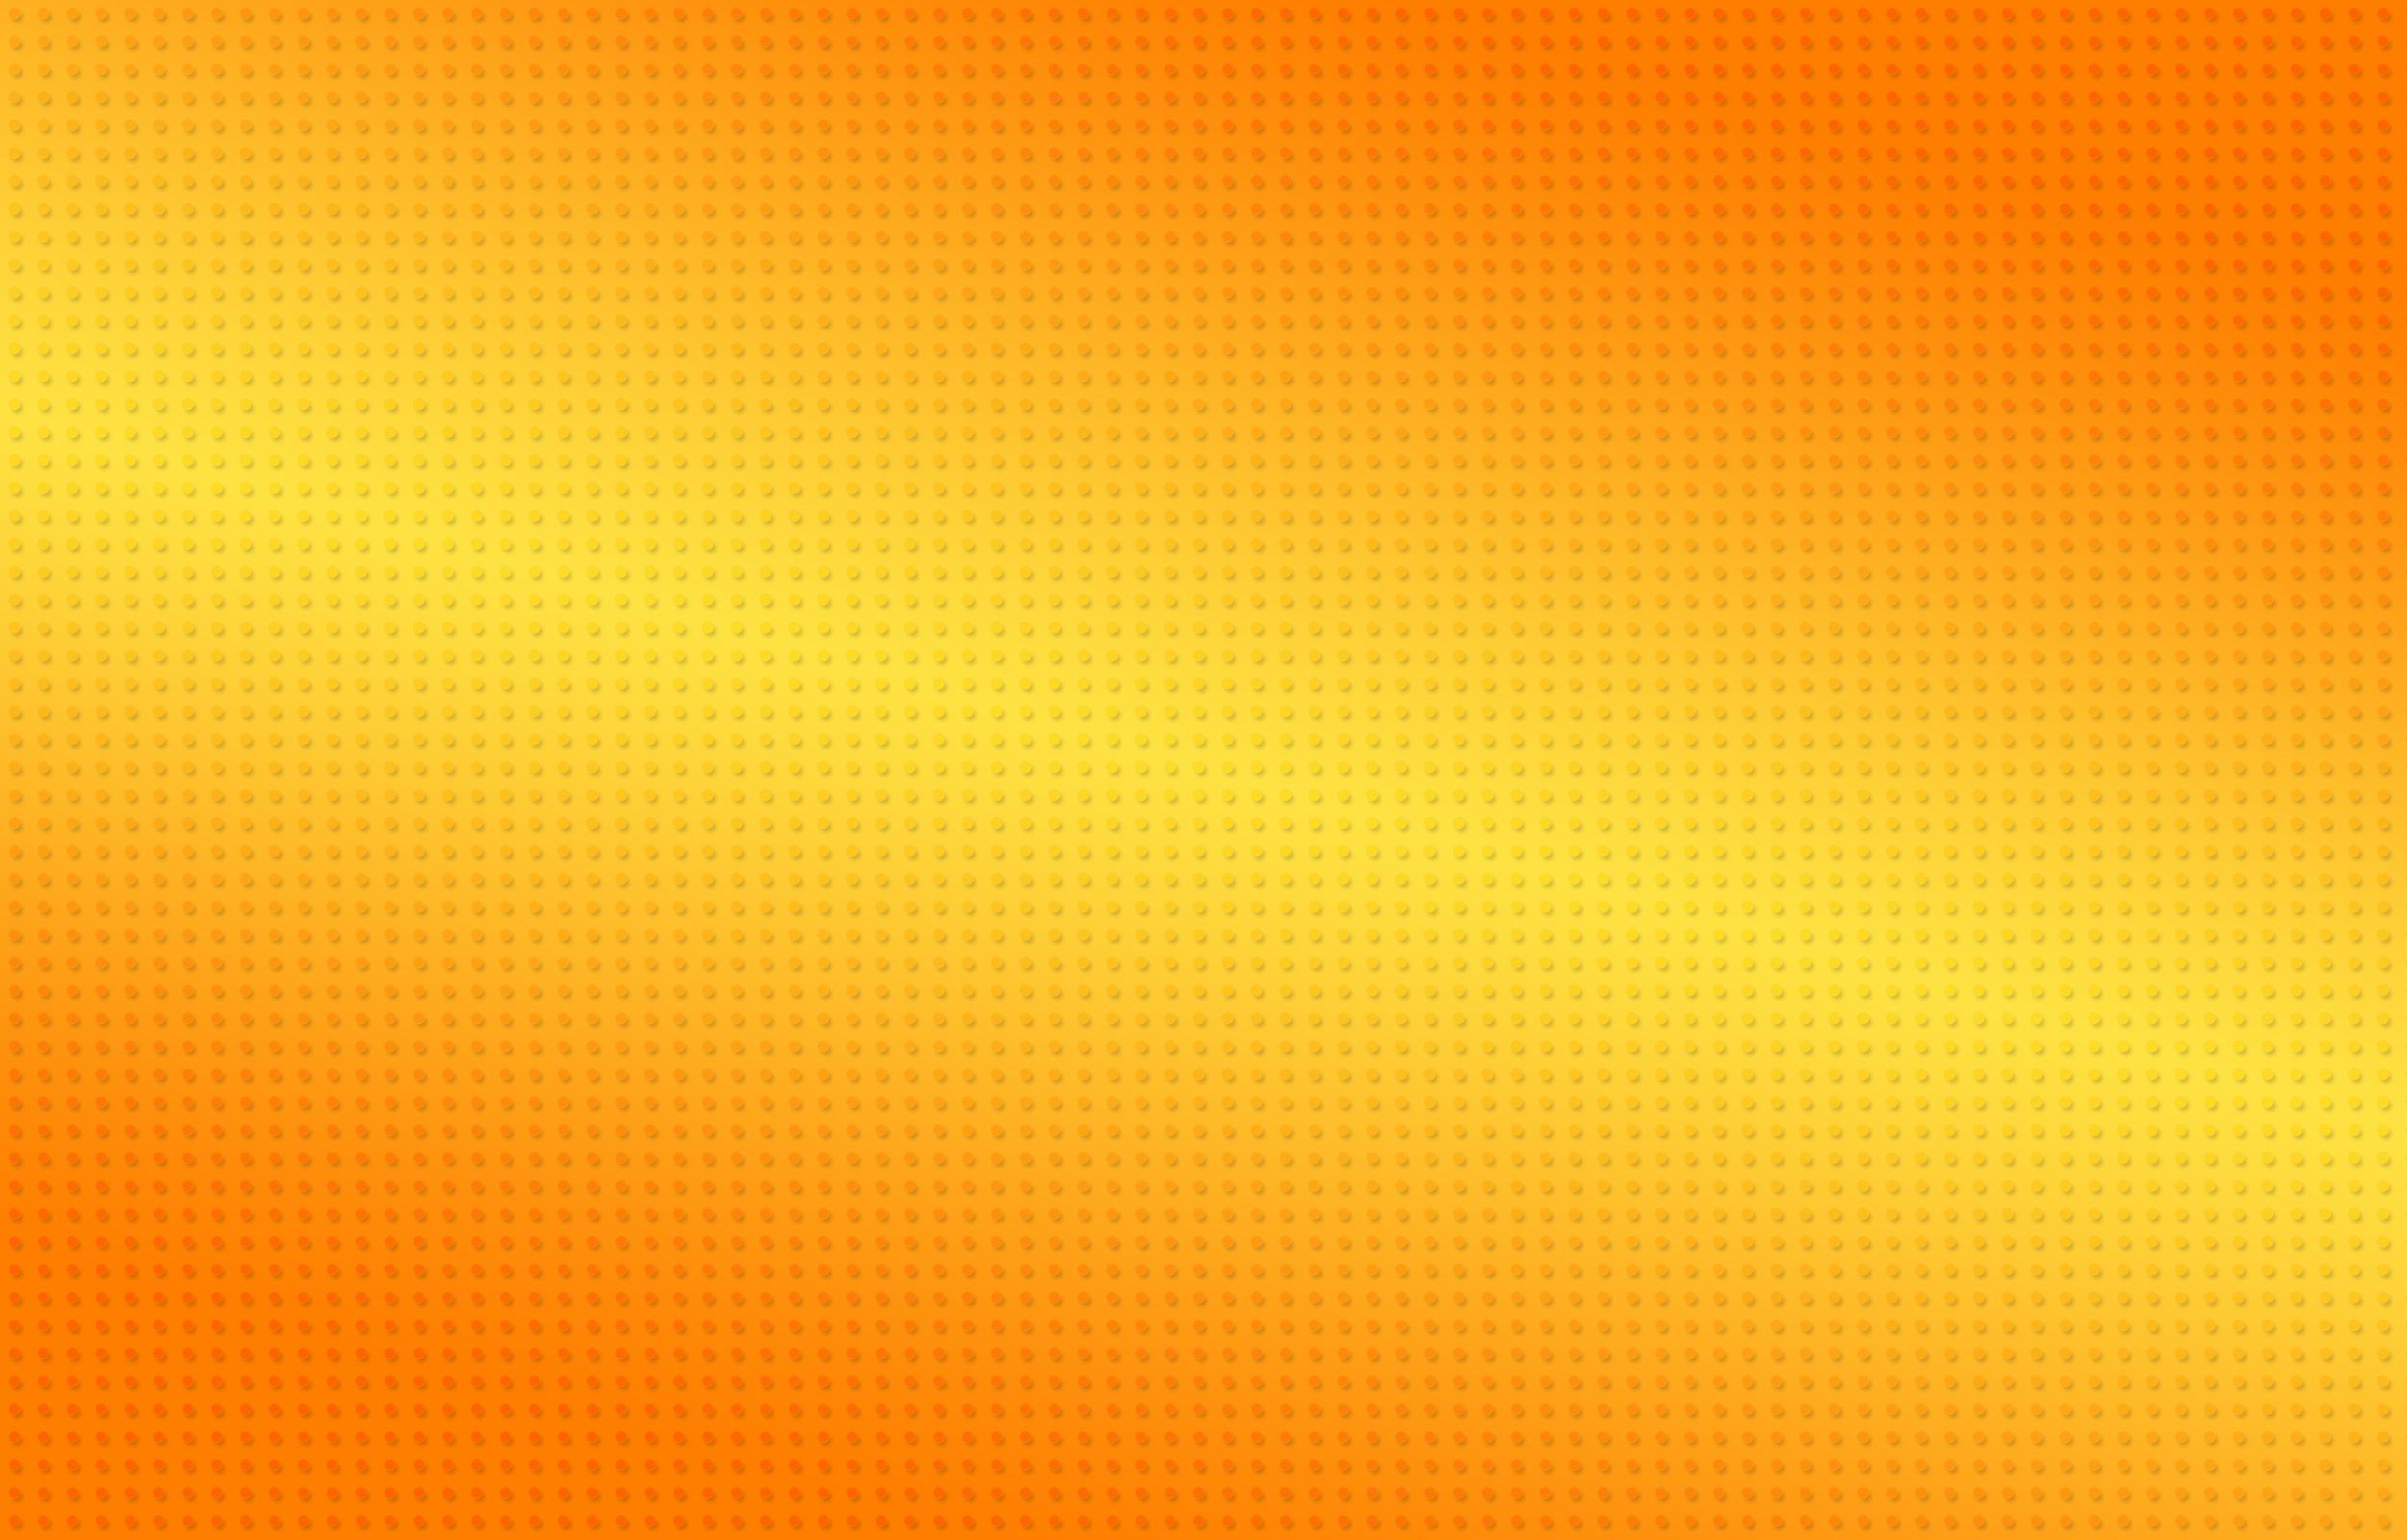 Orange Wallpaper   Orange Photo 34512842 2500x1600